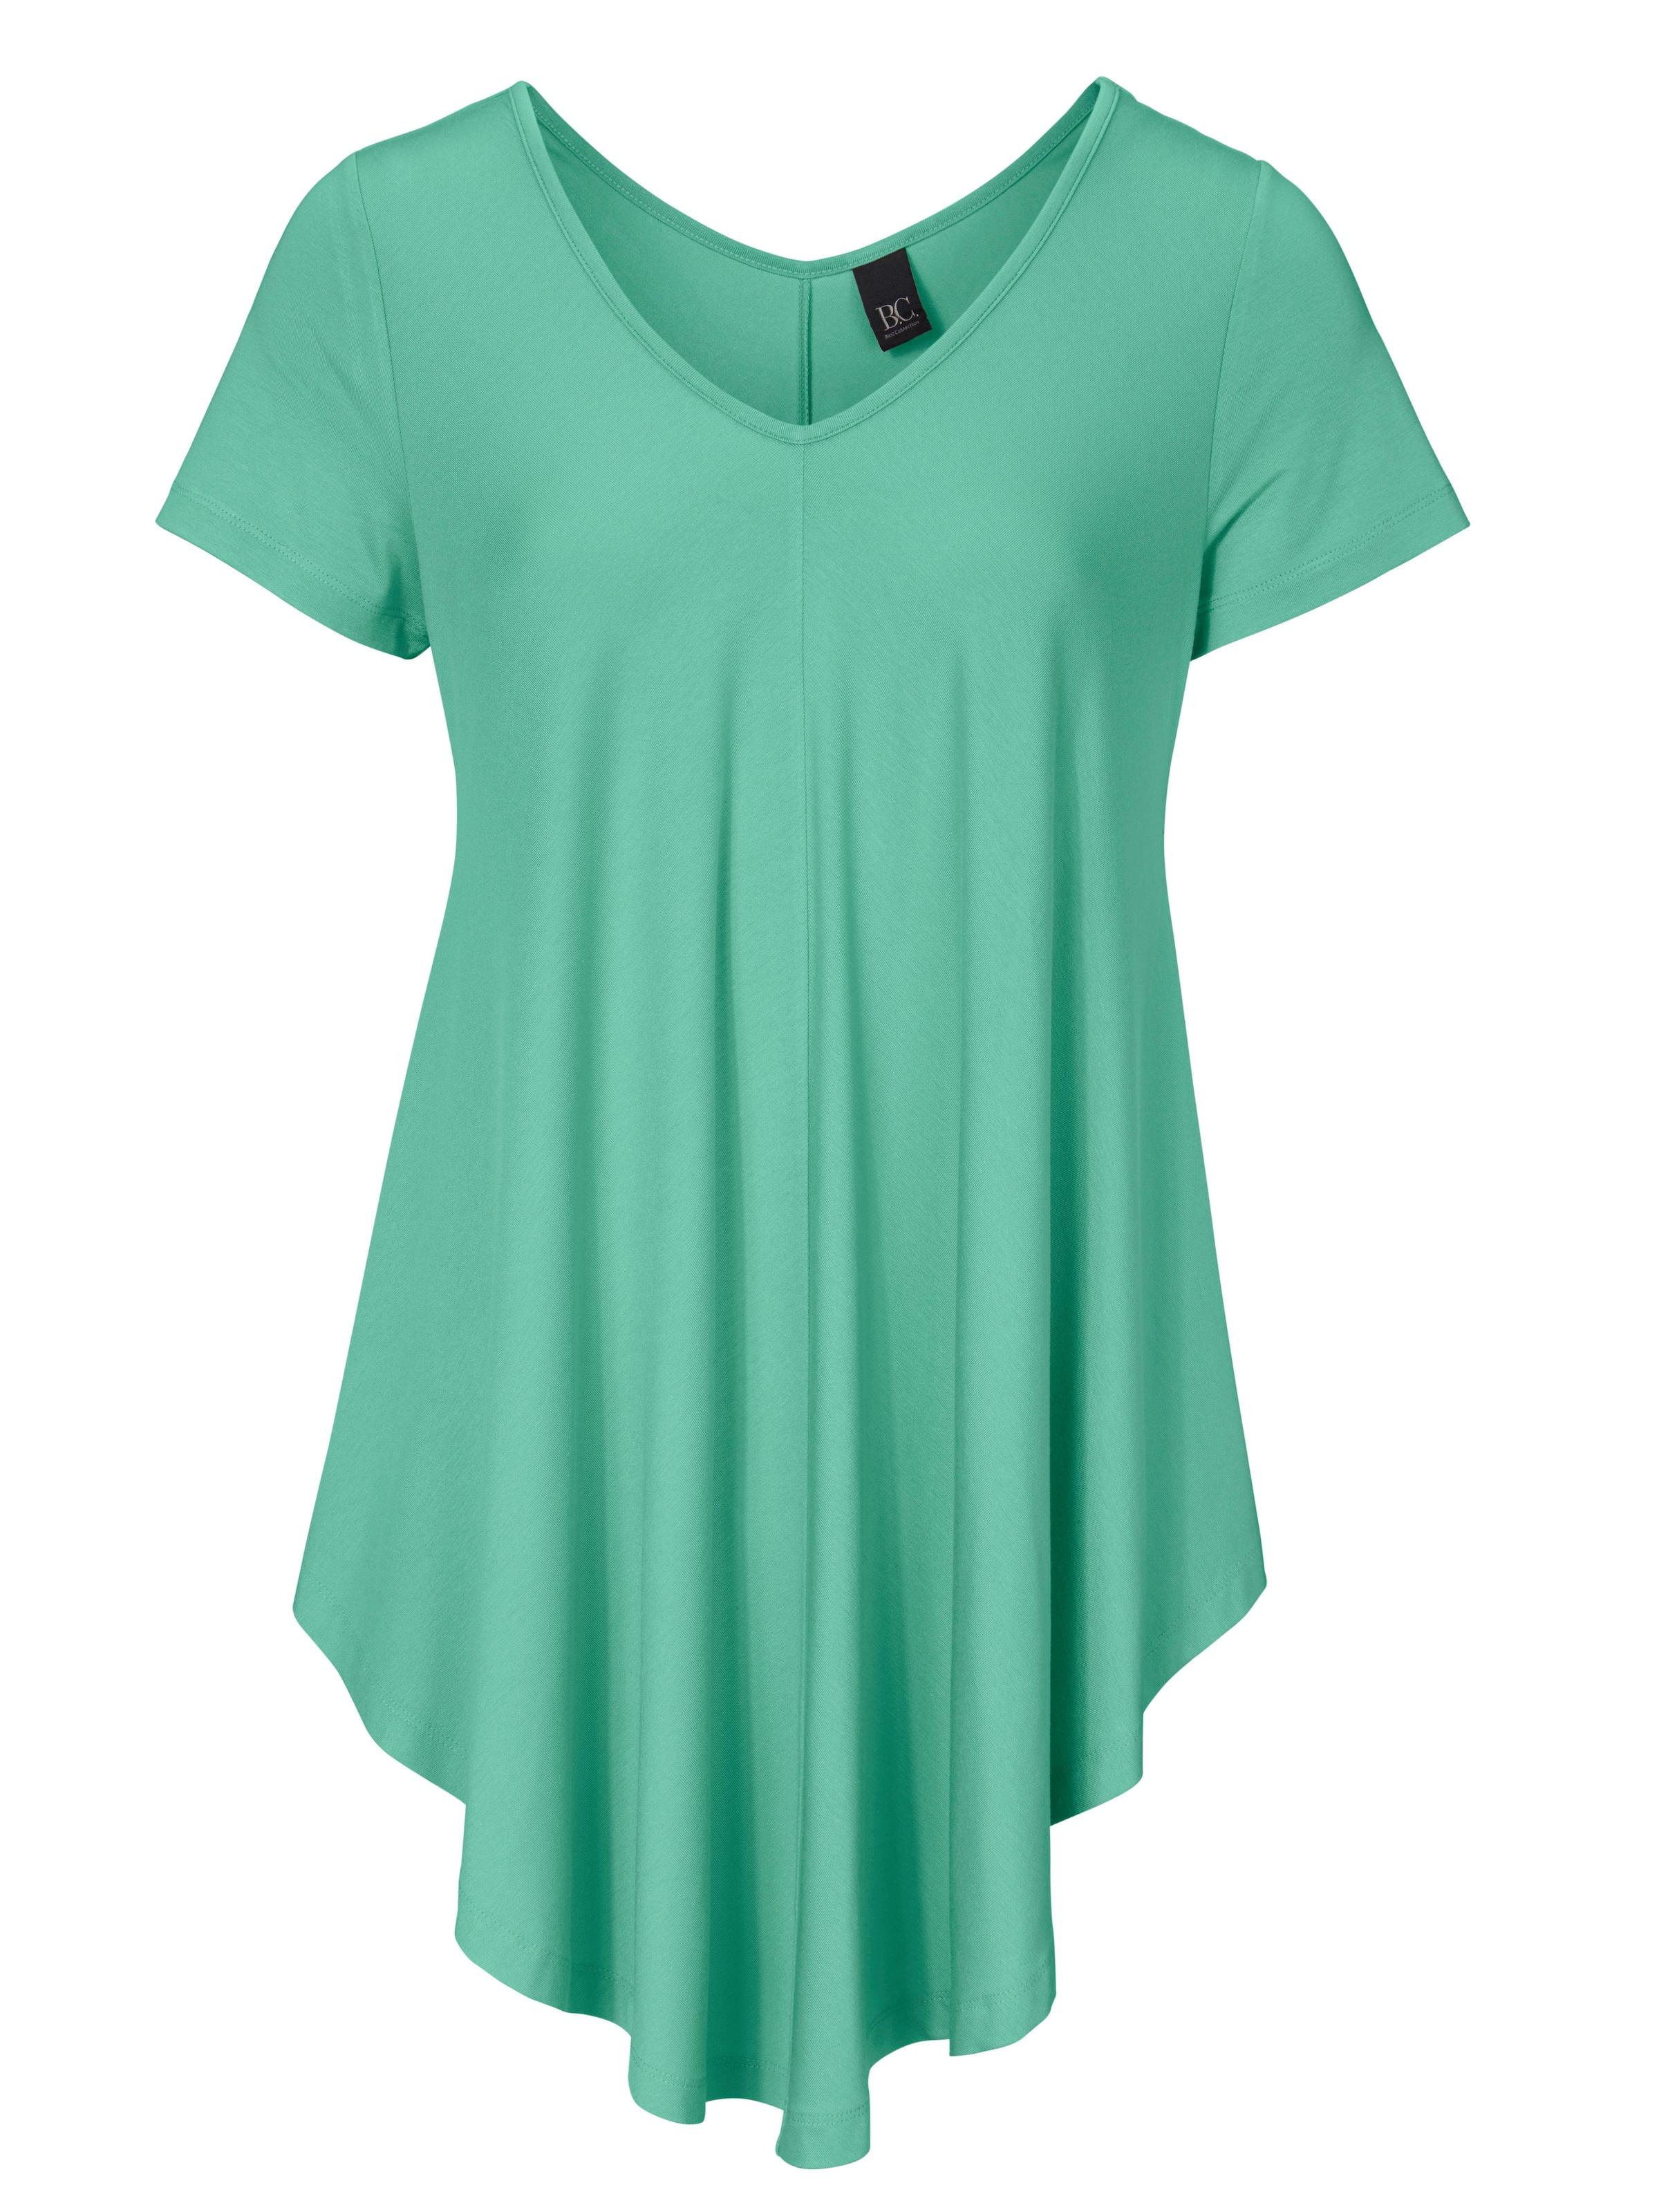 In Heine Jade In Heine Jade Shirt Shirt Jade Shirt Shirt In Heine Heine nOvwN0ym8